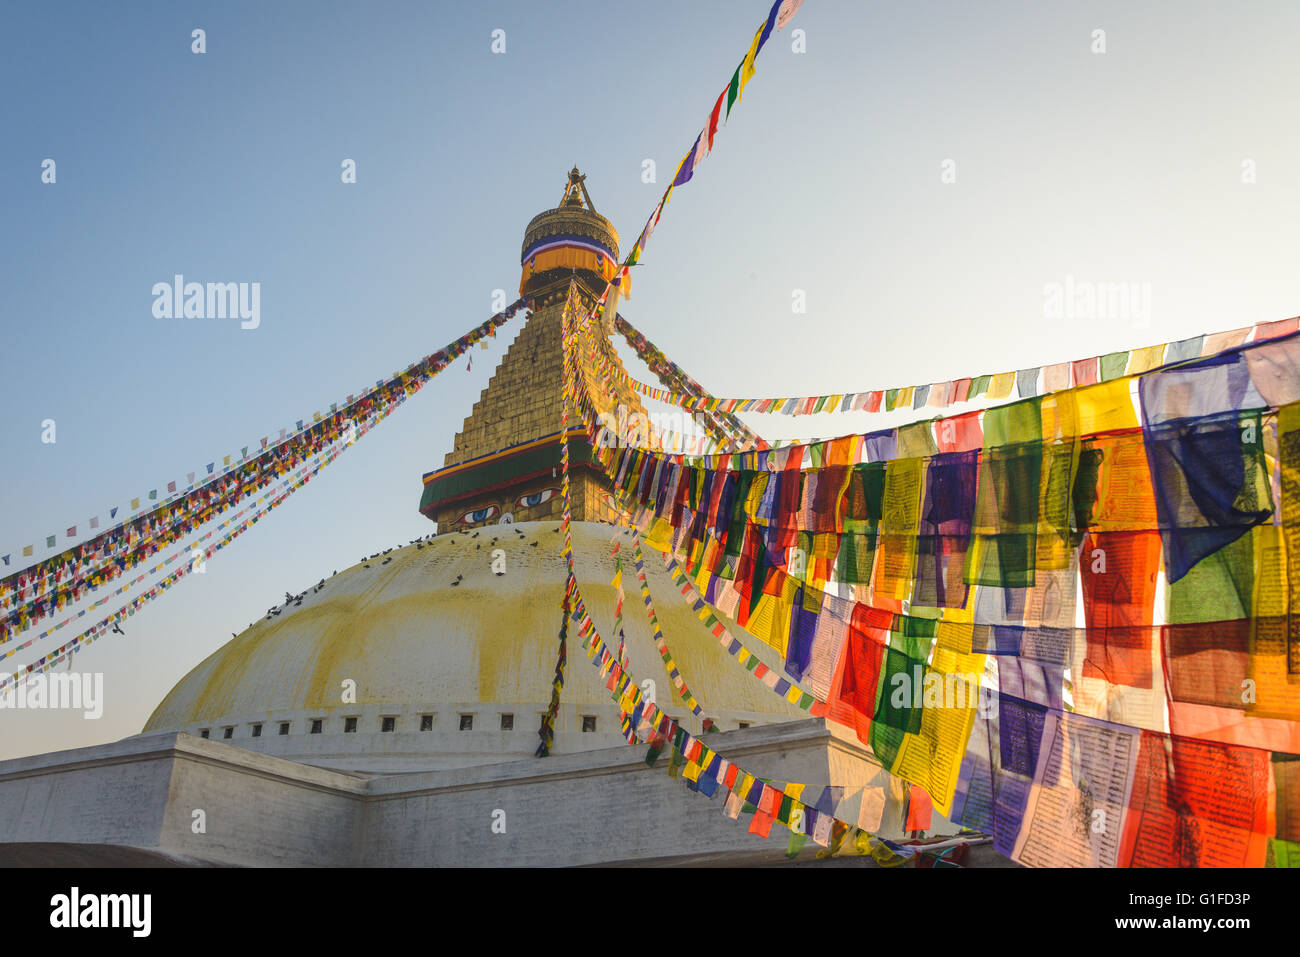 Boudhanath Stupa with hundreds of Pigeons and Prayer flags in Kathmandu, Nepal - Stock Image